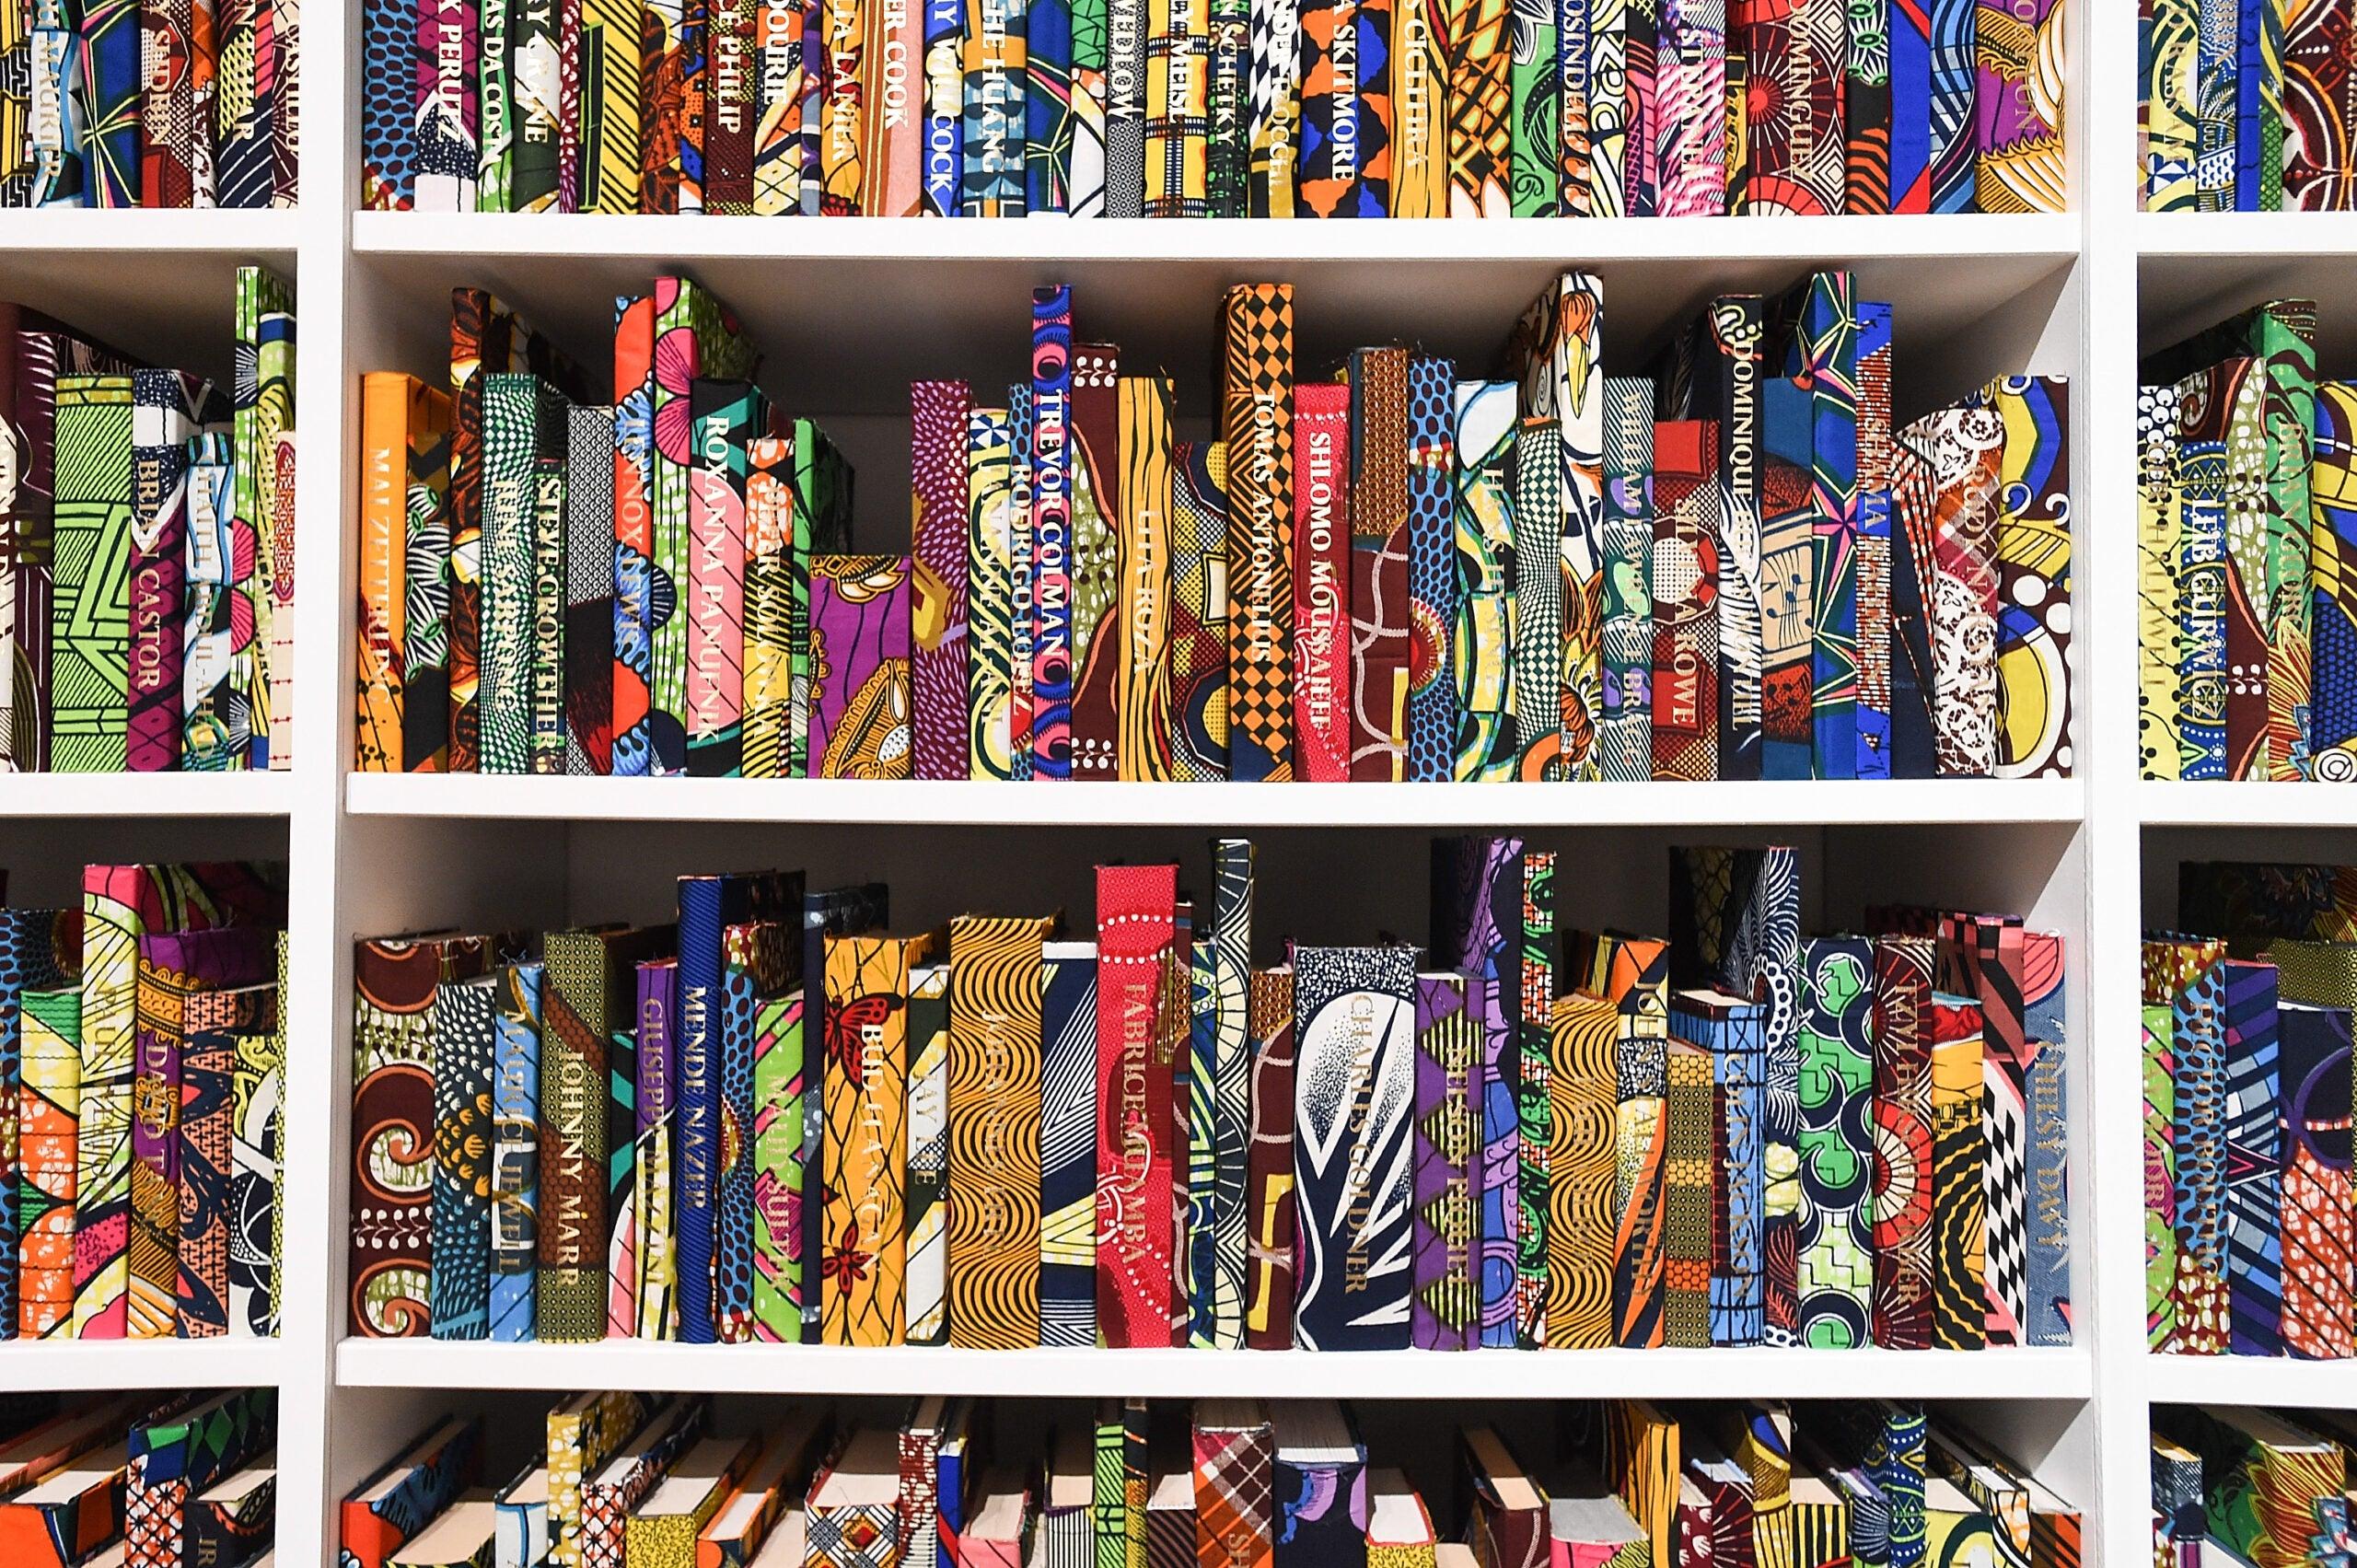 Bernardine Evaristo: British schools sideline writers of colour